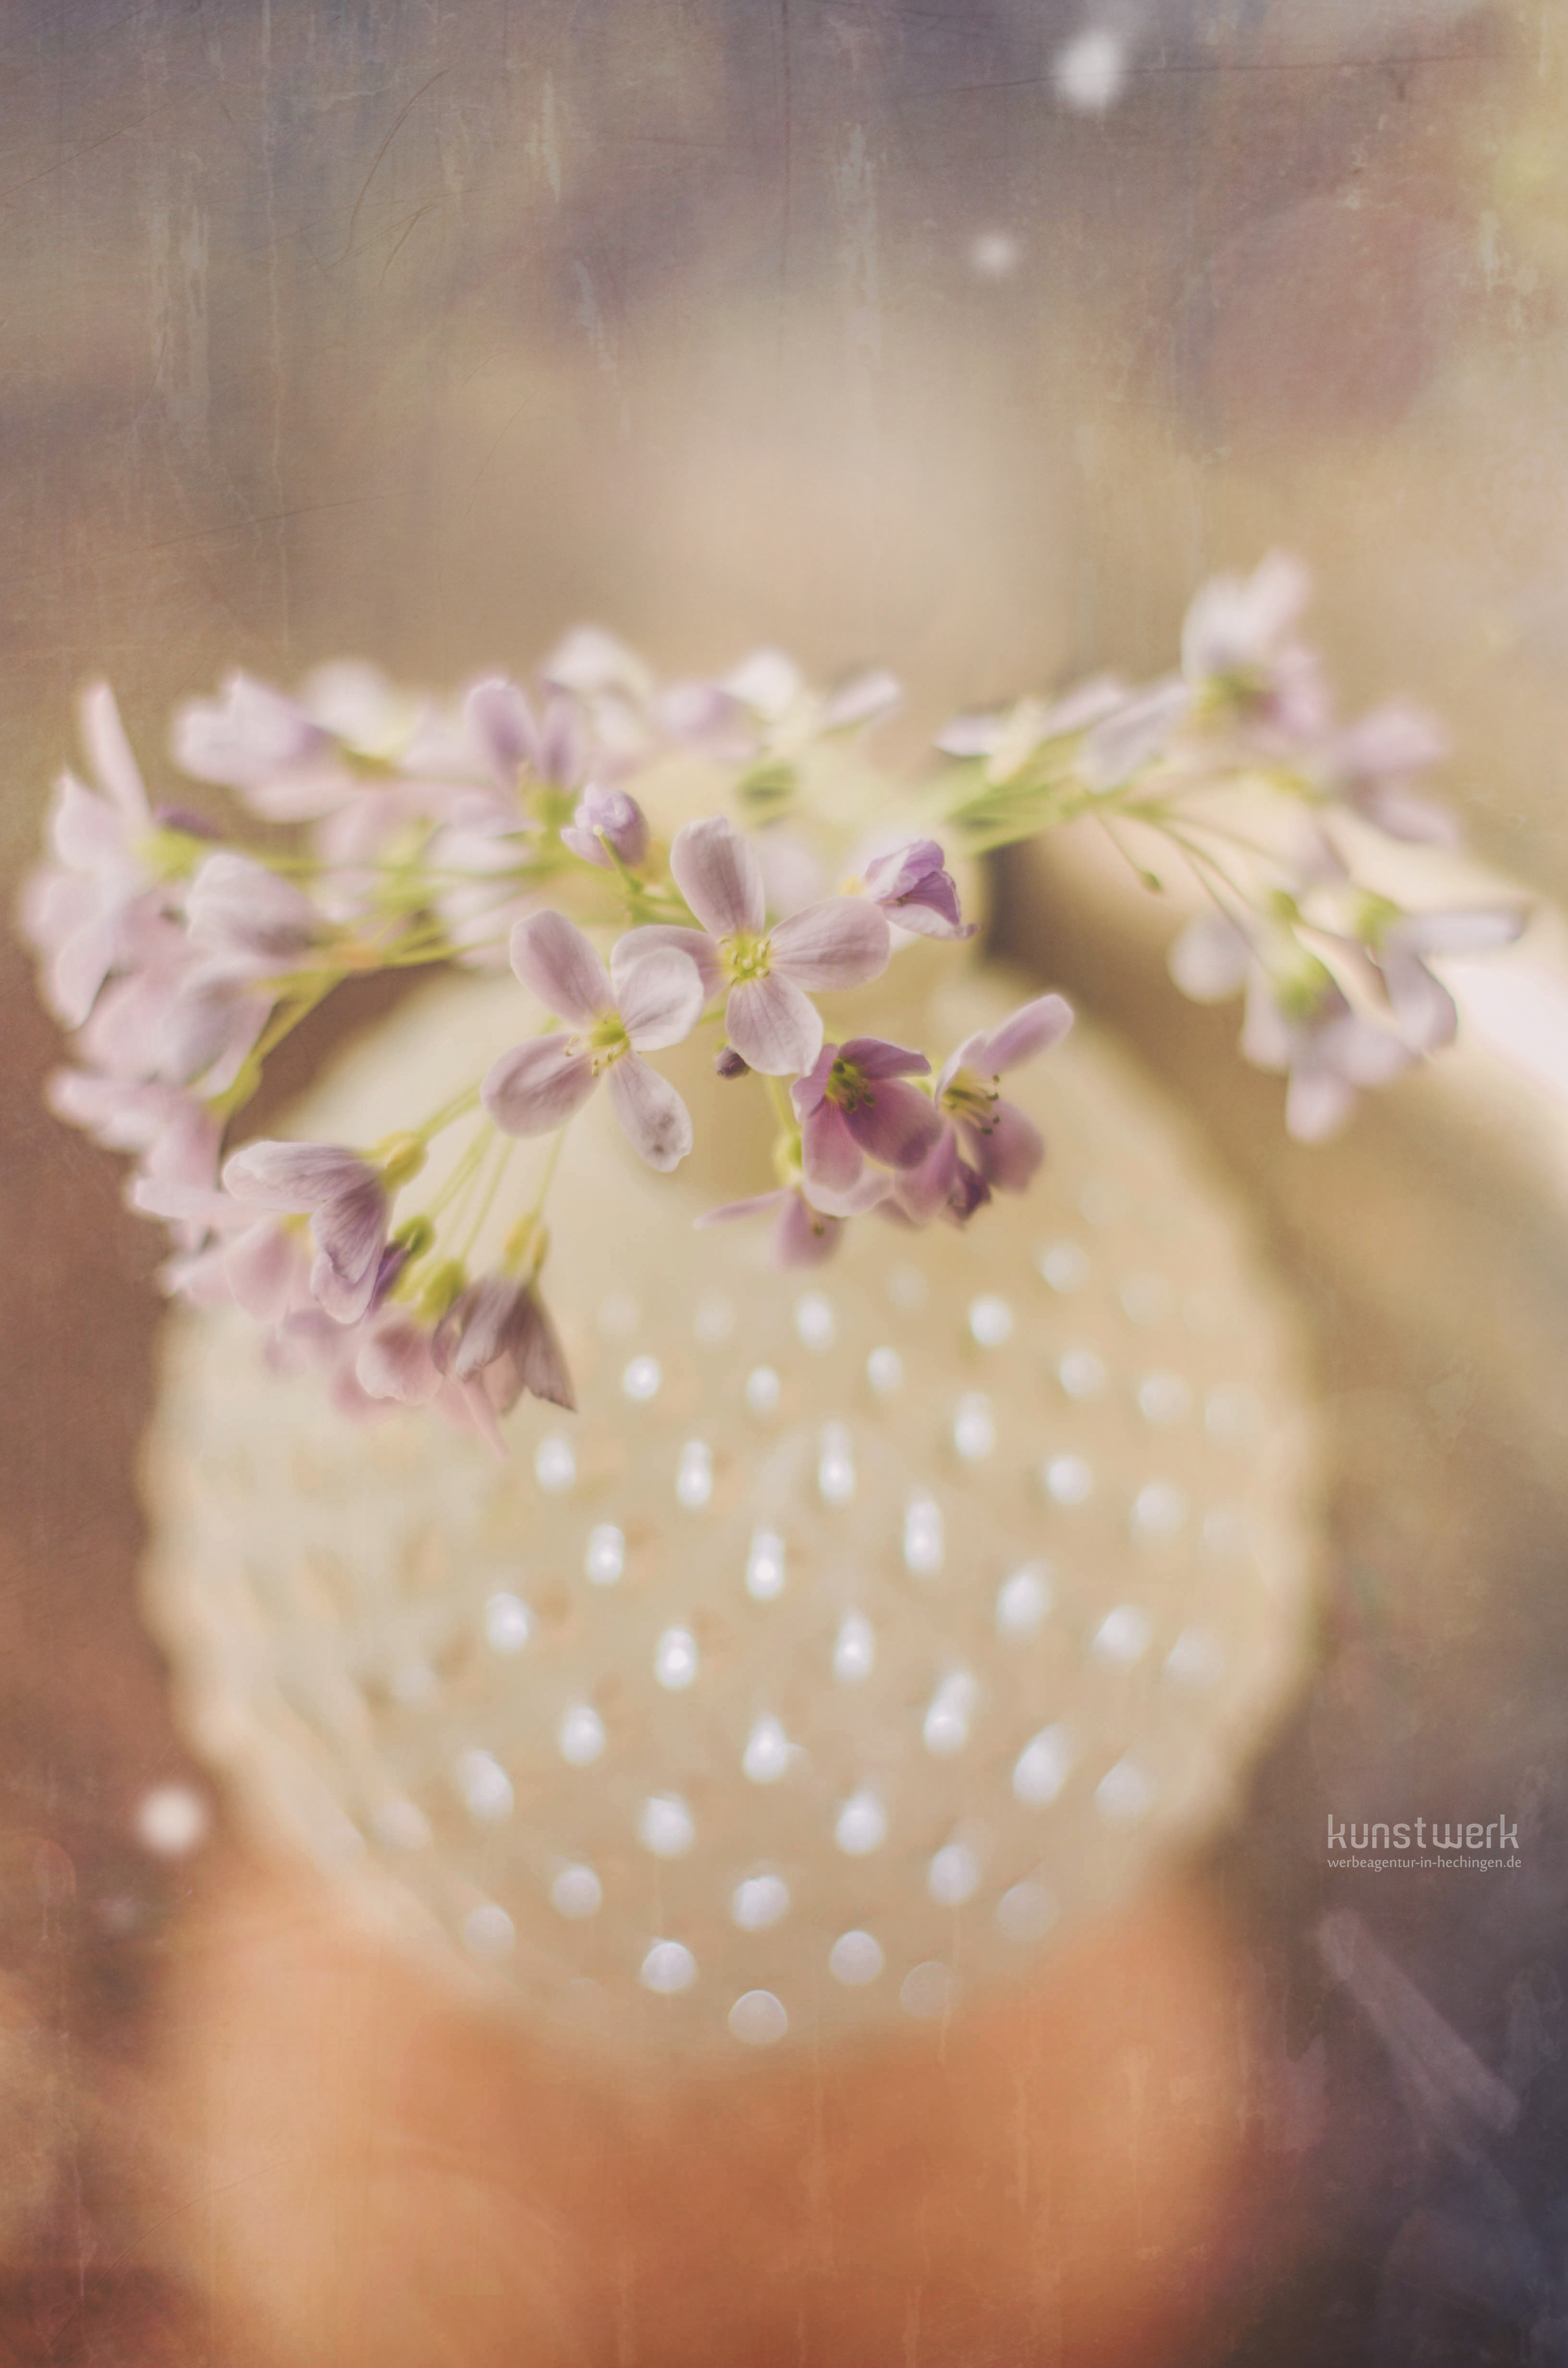 Intime Blüten 4